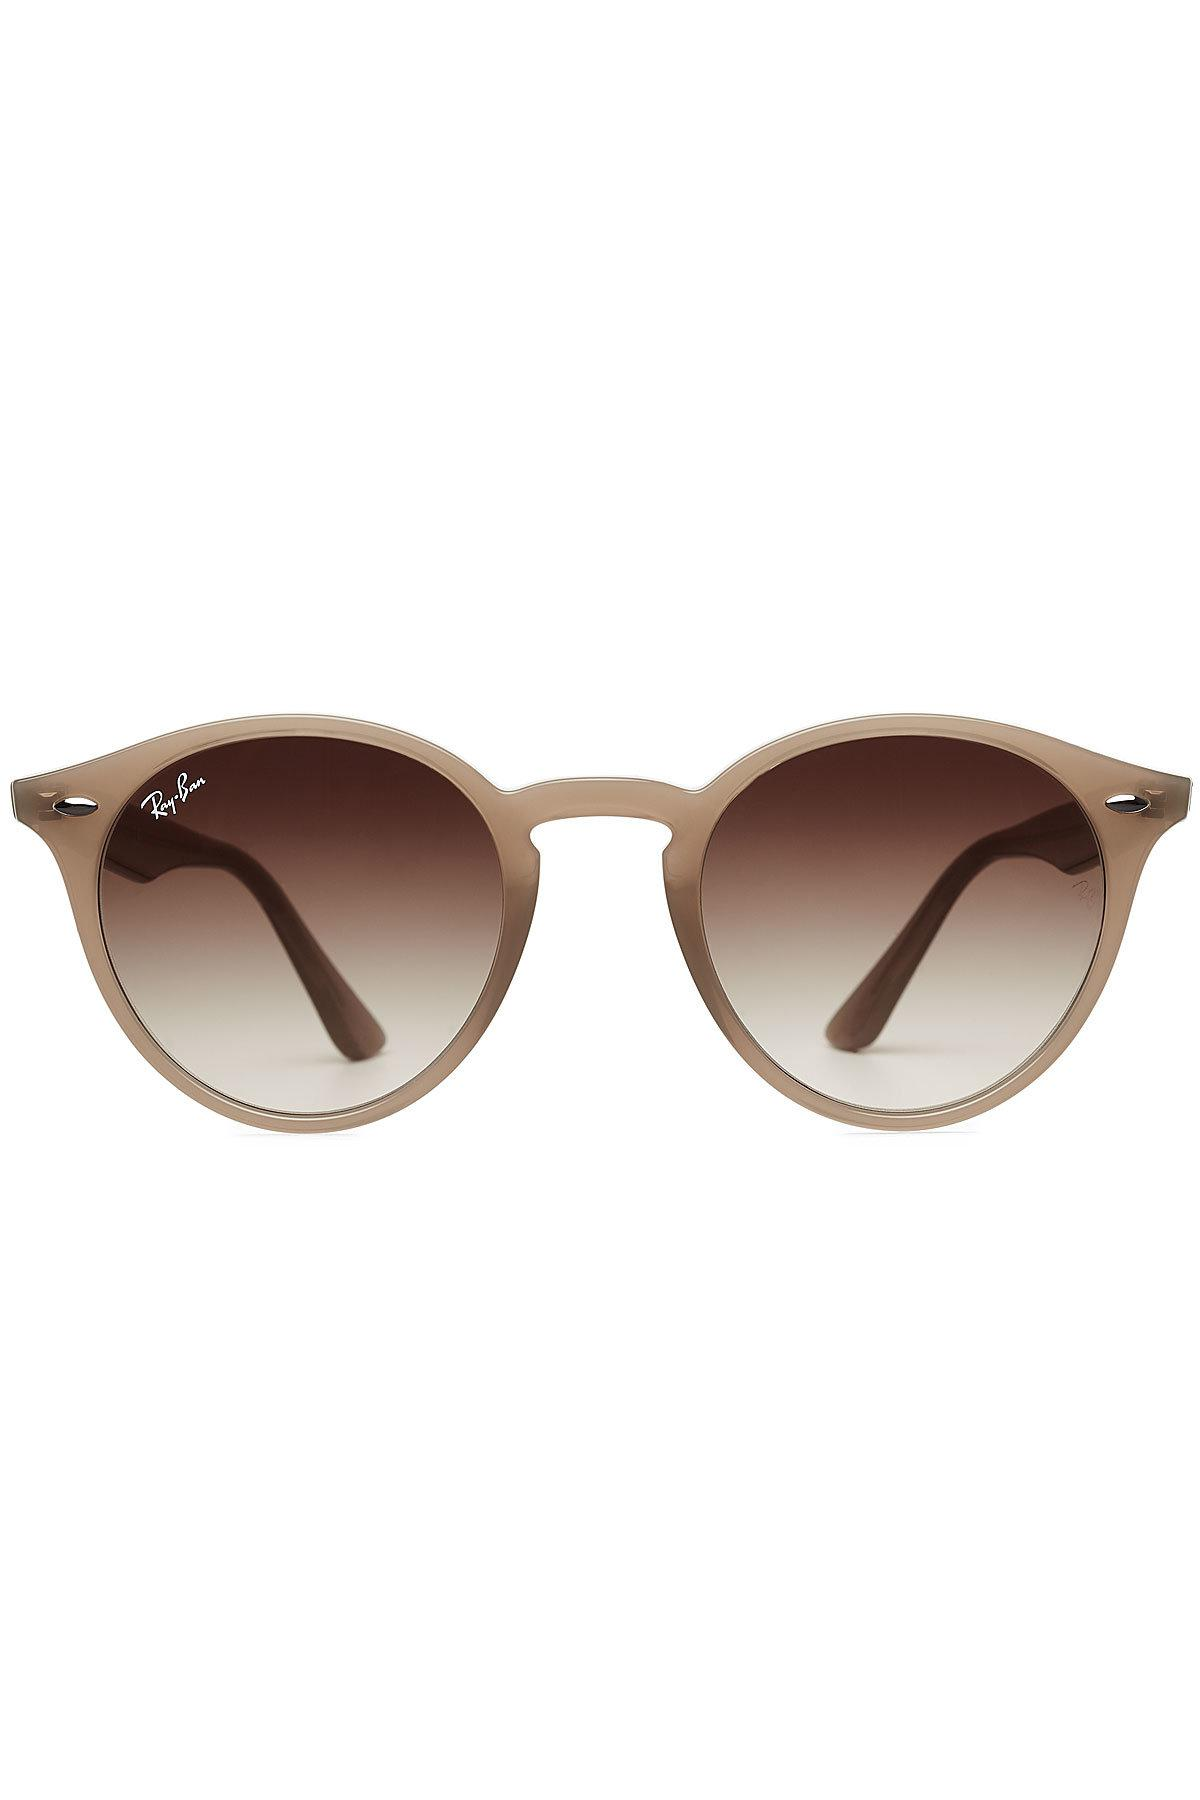 f918a7e6784 Ray-ban Rb2180 Polarised Round Sunglasses Tortoise